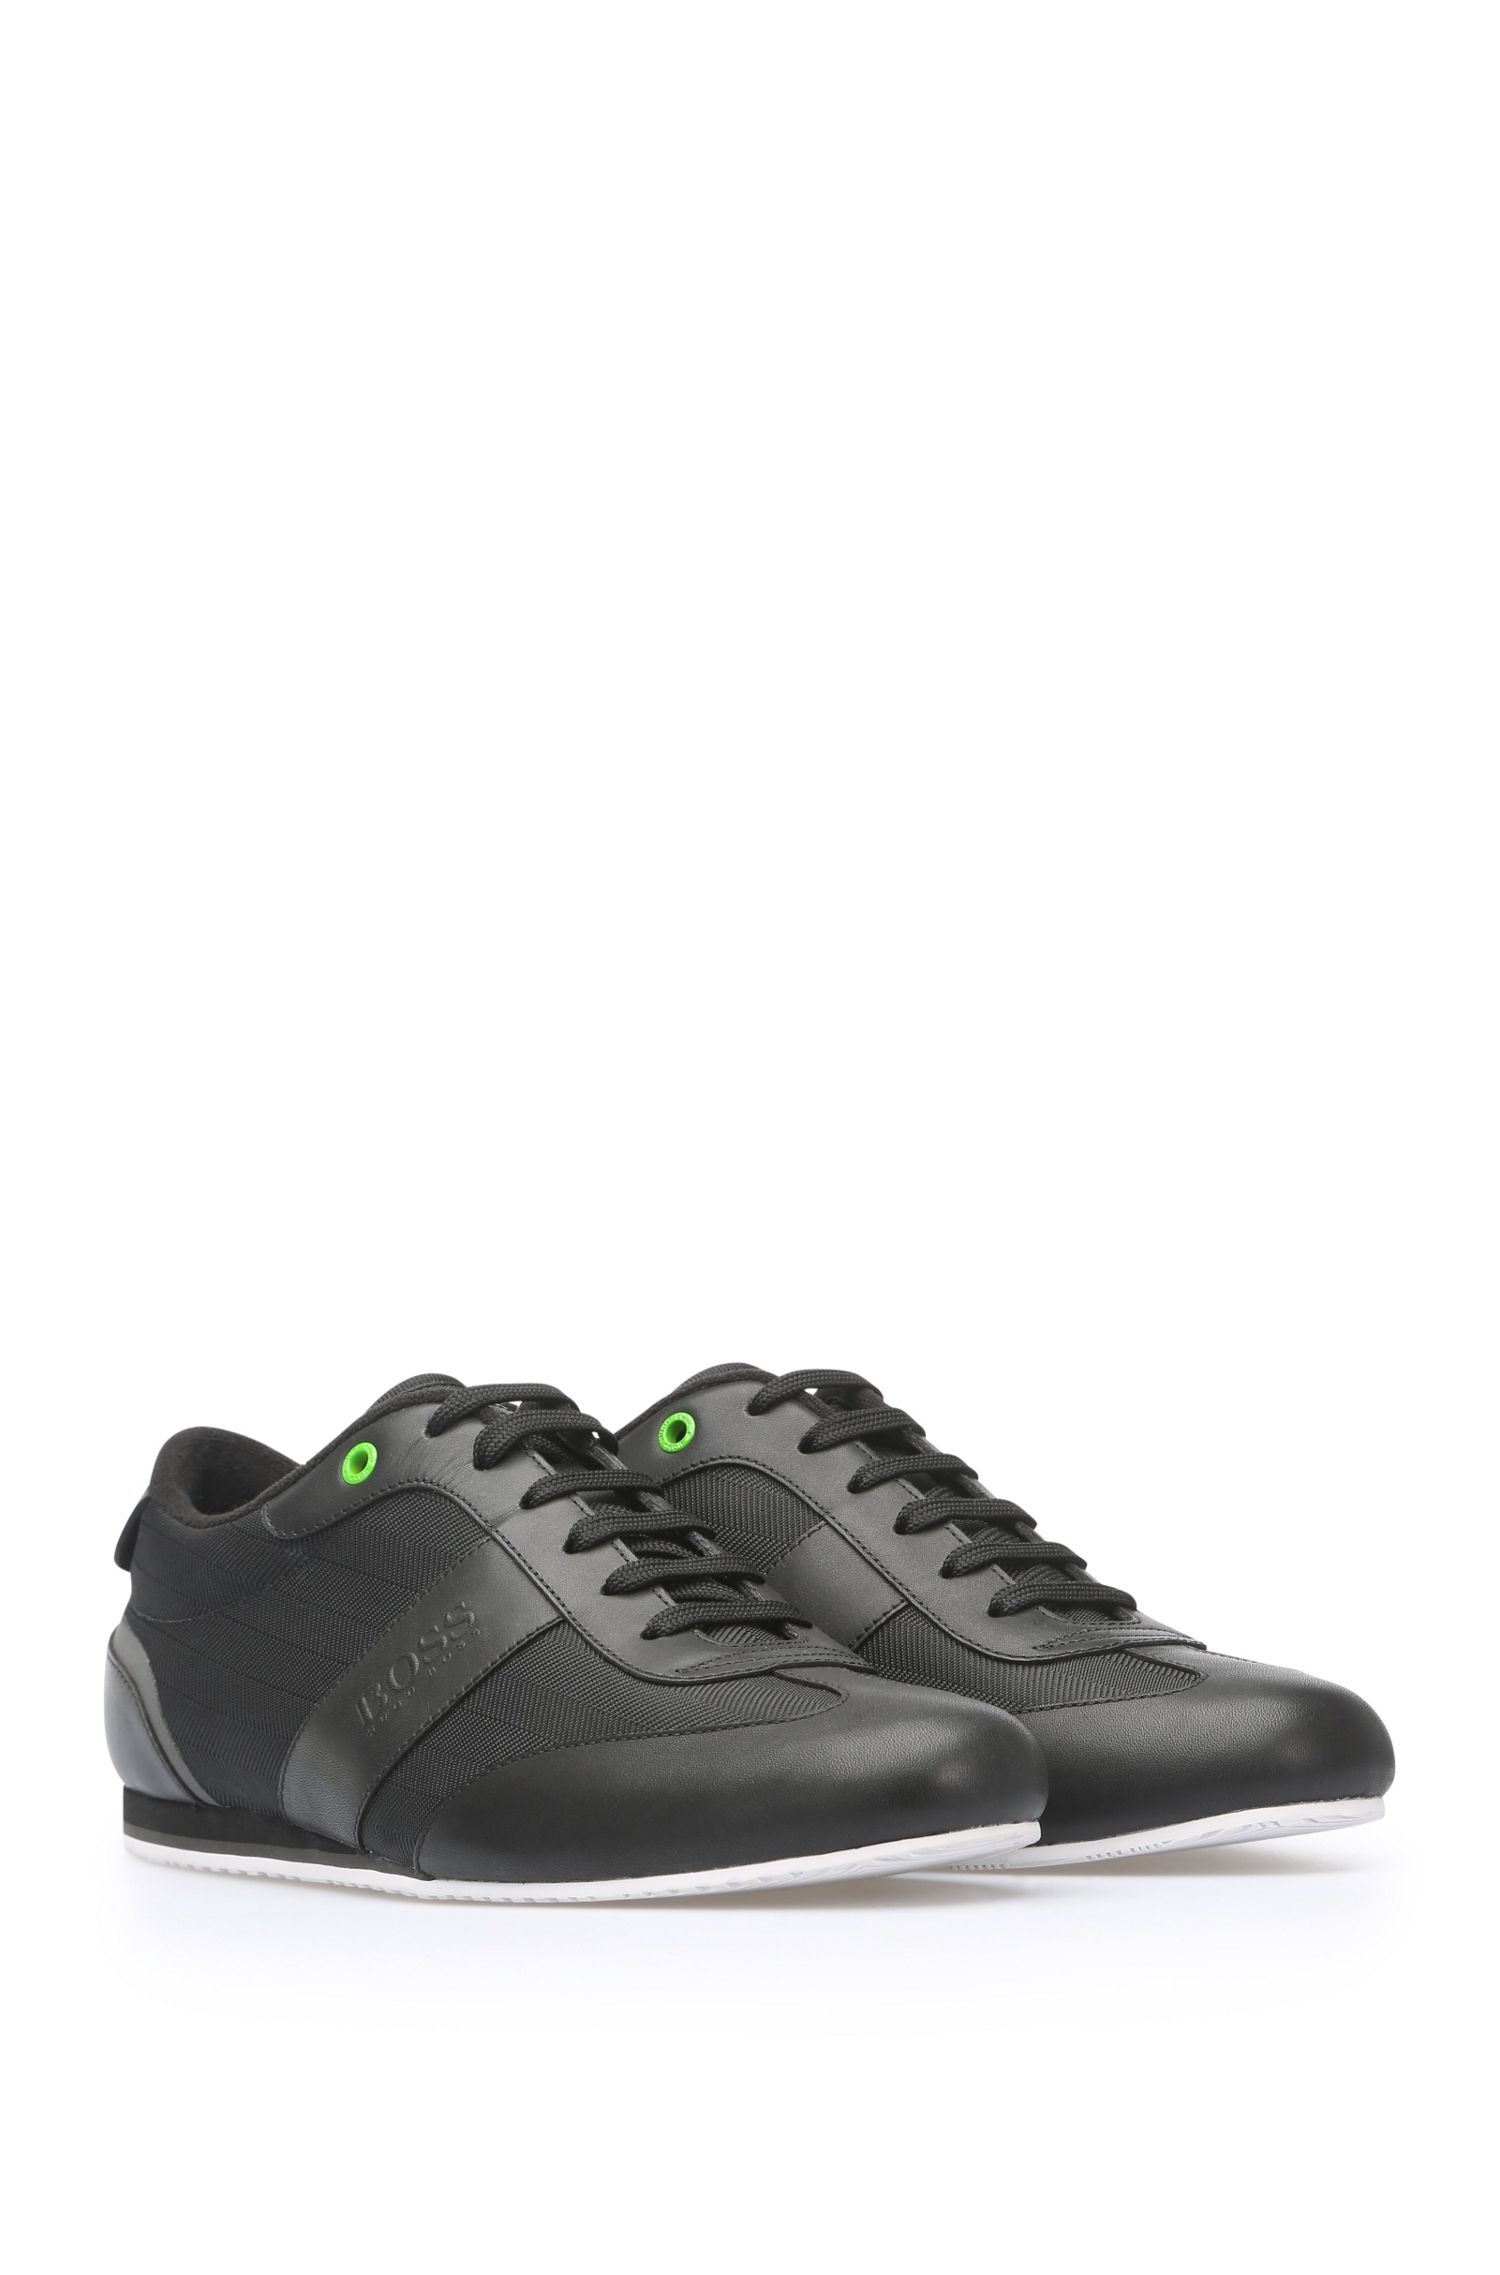 Sneakers aus gemustertem Textil und Leder: ´Lighter_Lowp_nyhr`